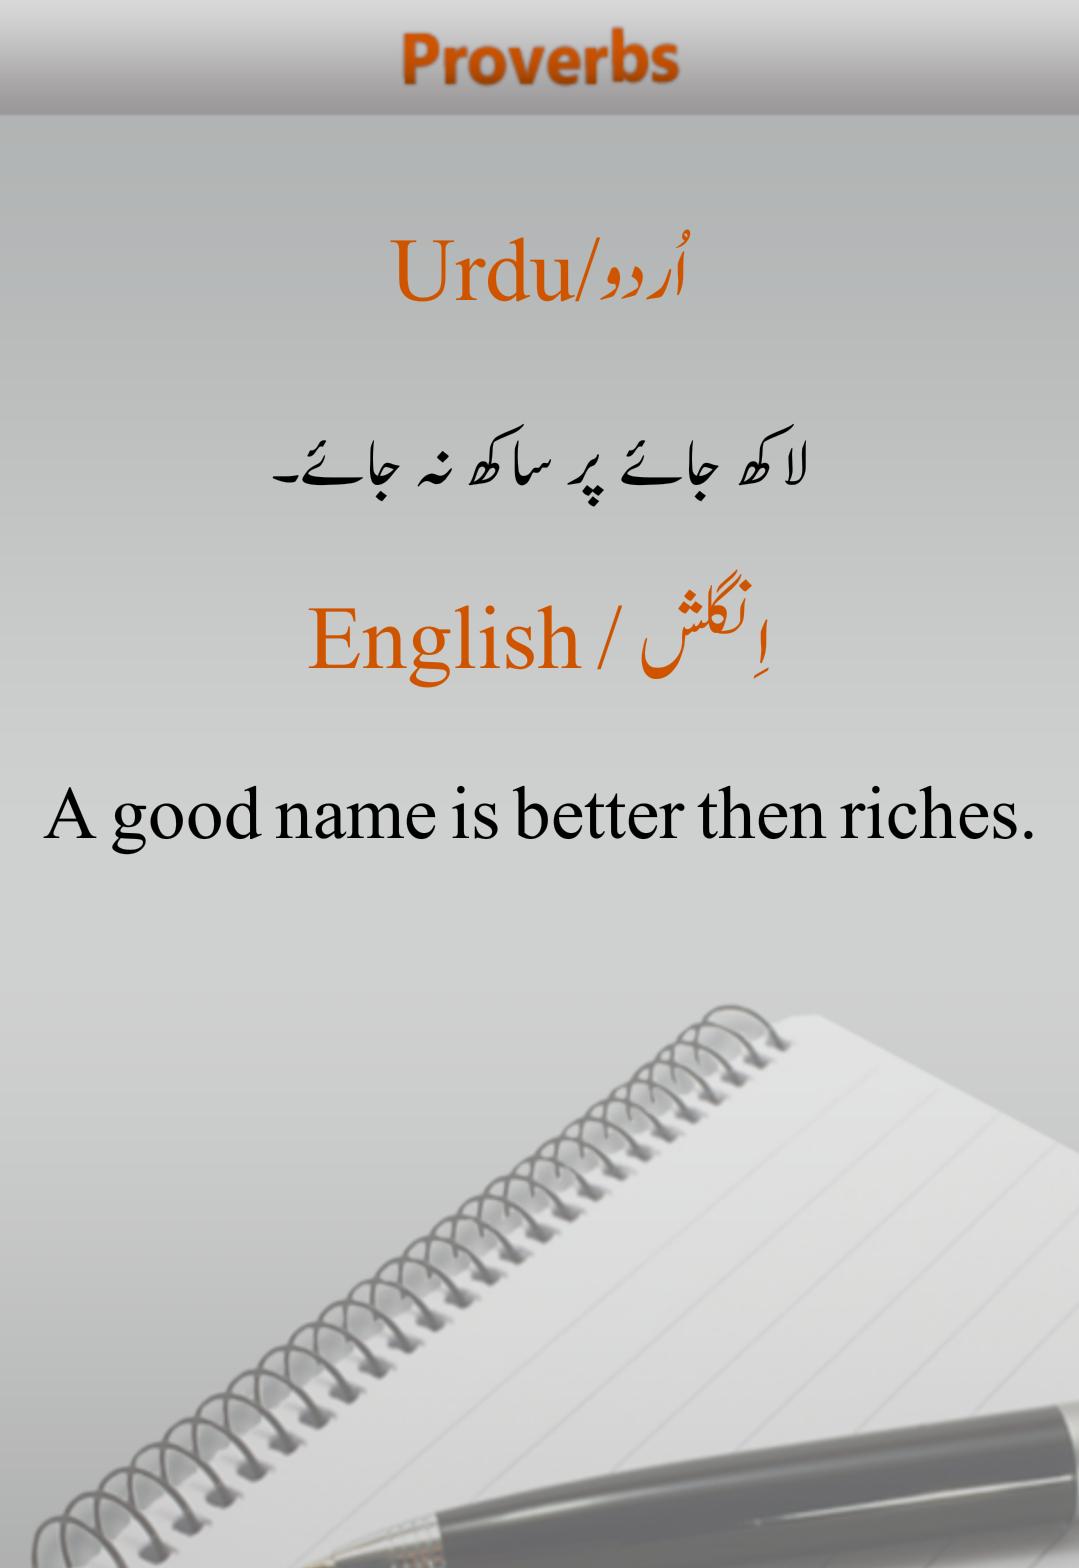 DIL KI DUNYA: English, urdu, PROVERBS,